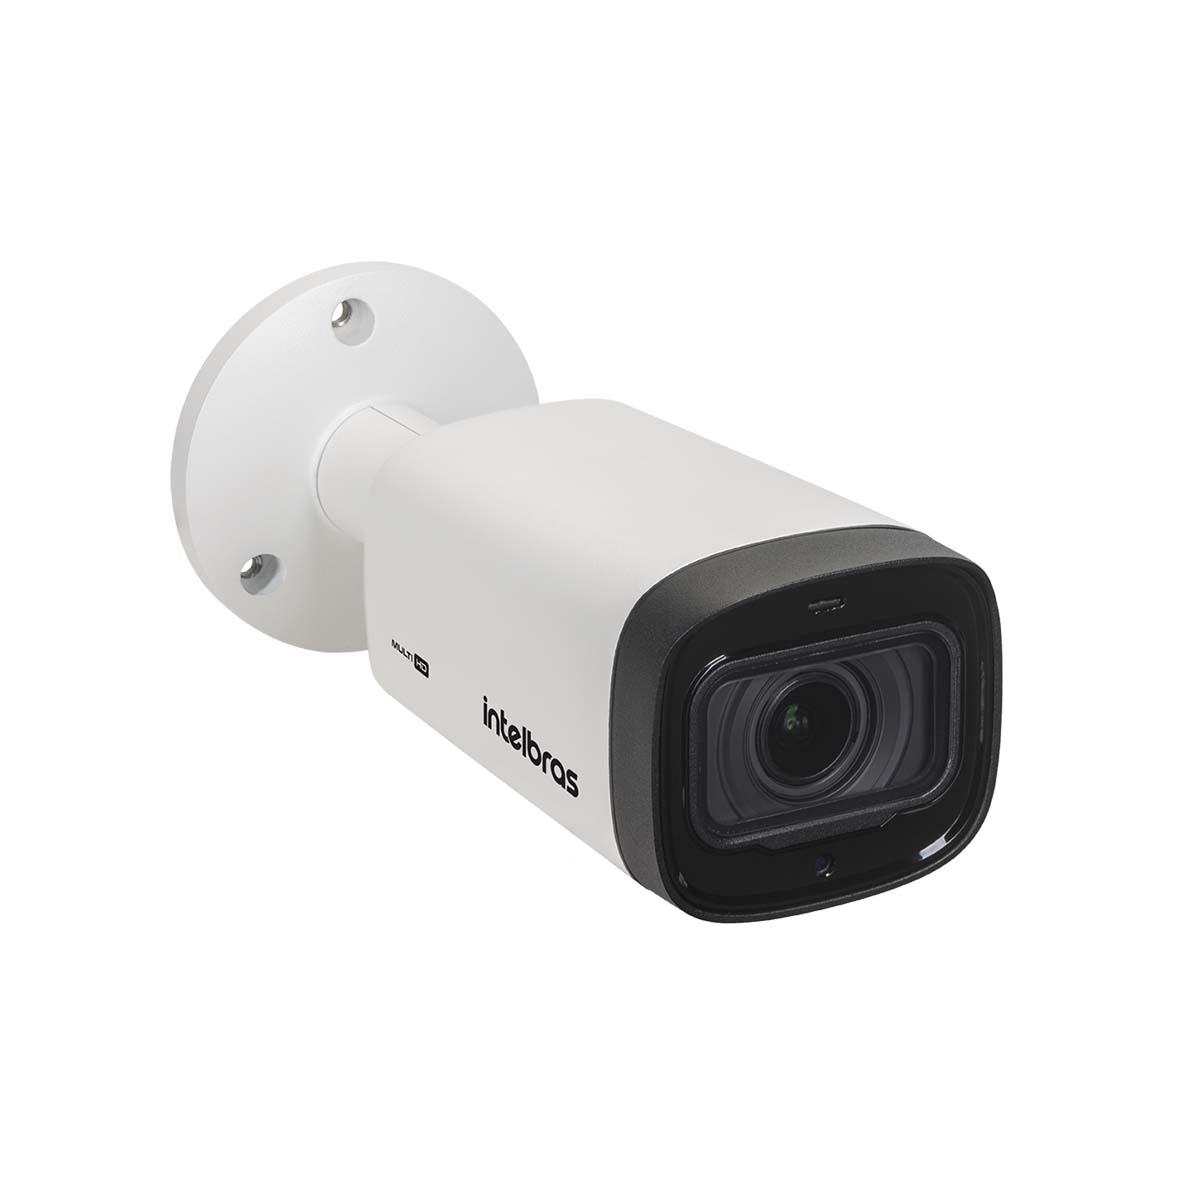 Kit 10 Câmera Intelbras Vhd 3240 Vf G6 1080p 2,7 A 12mm